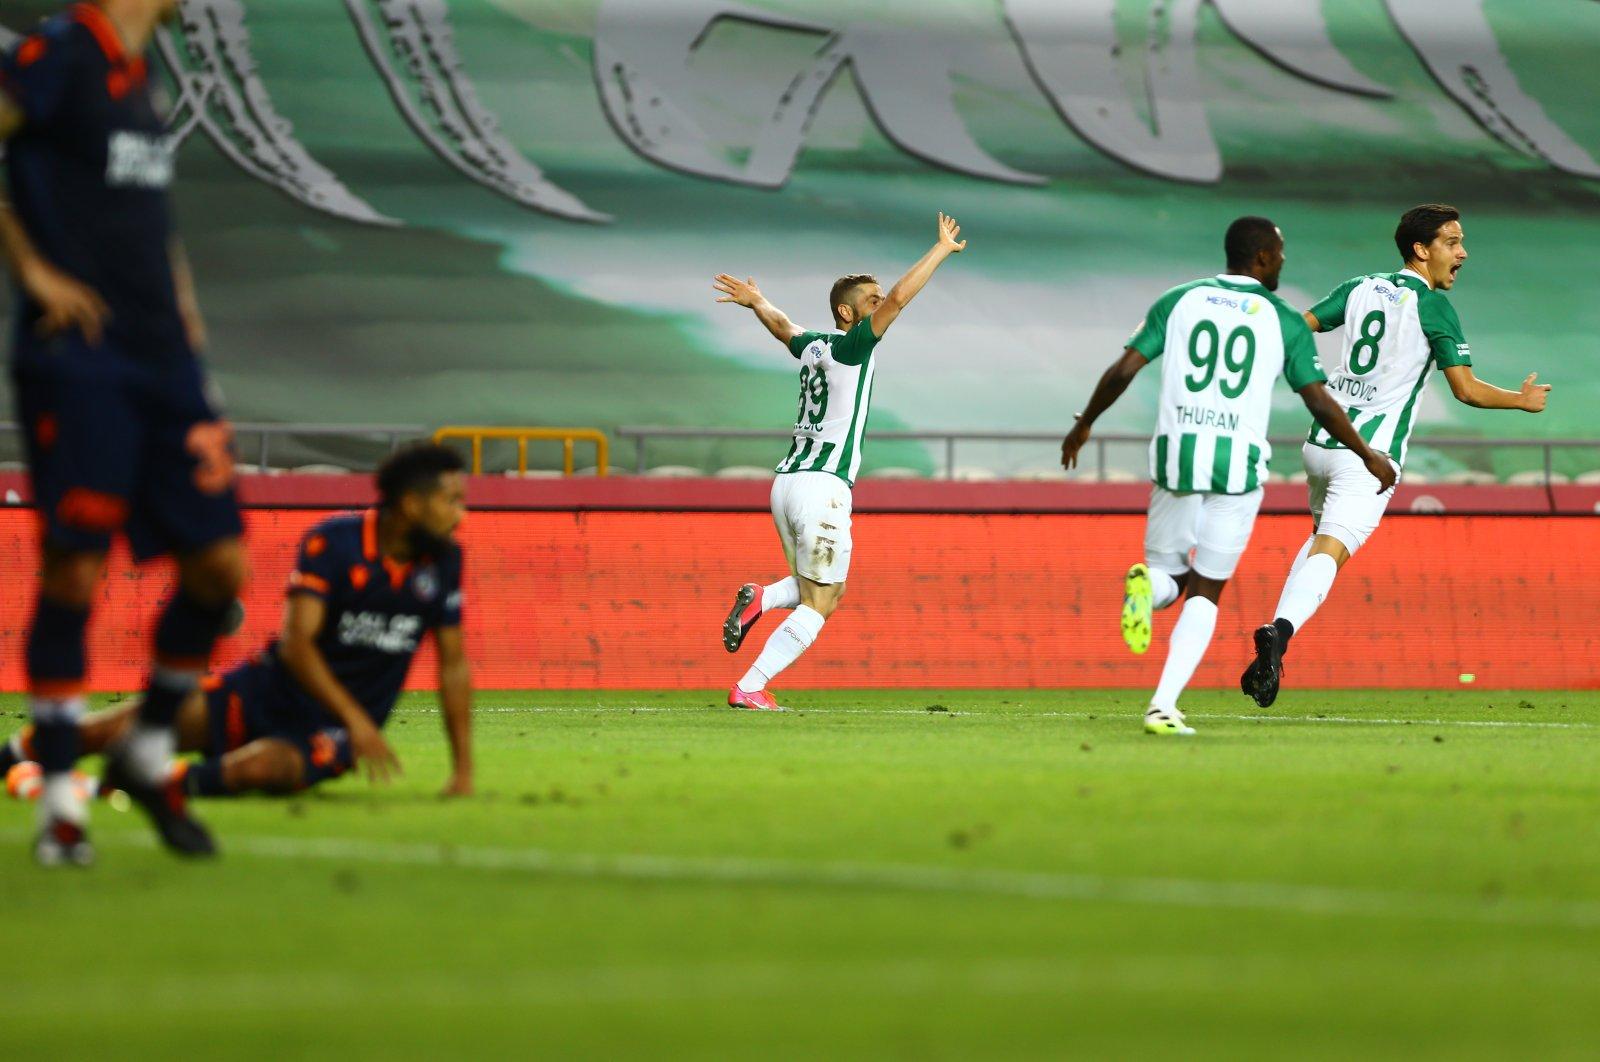 Konyaspor players celebrate defeating Başakşehir in Konya, Turkey, July 13, 2020. (AA Photo)